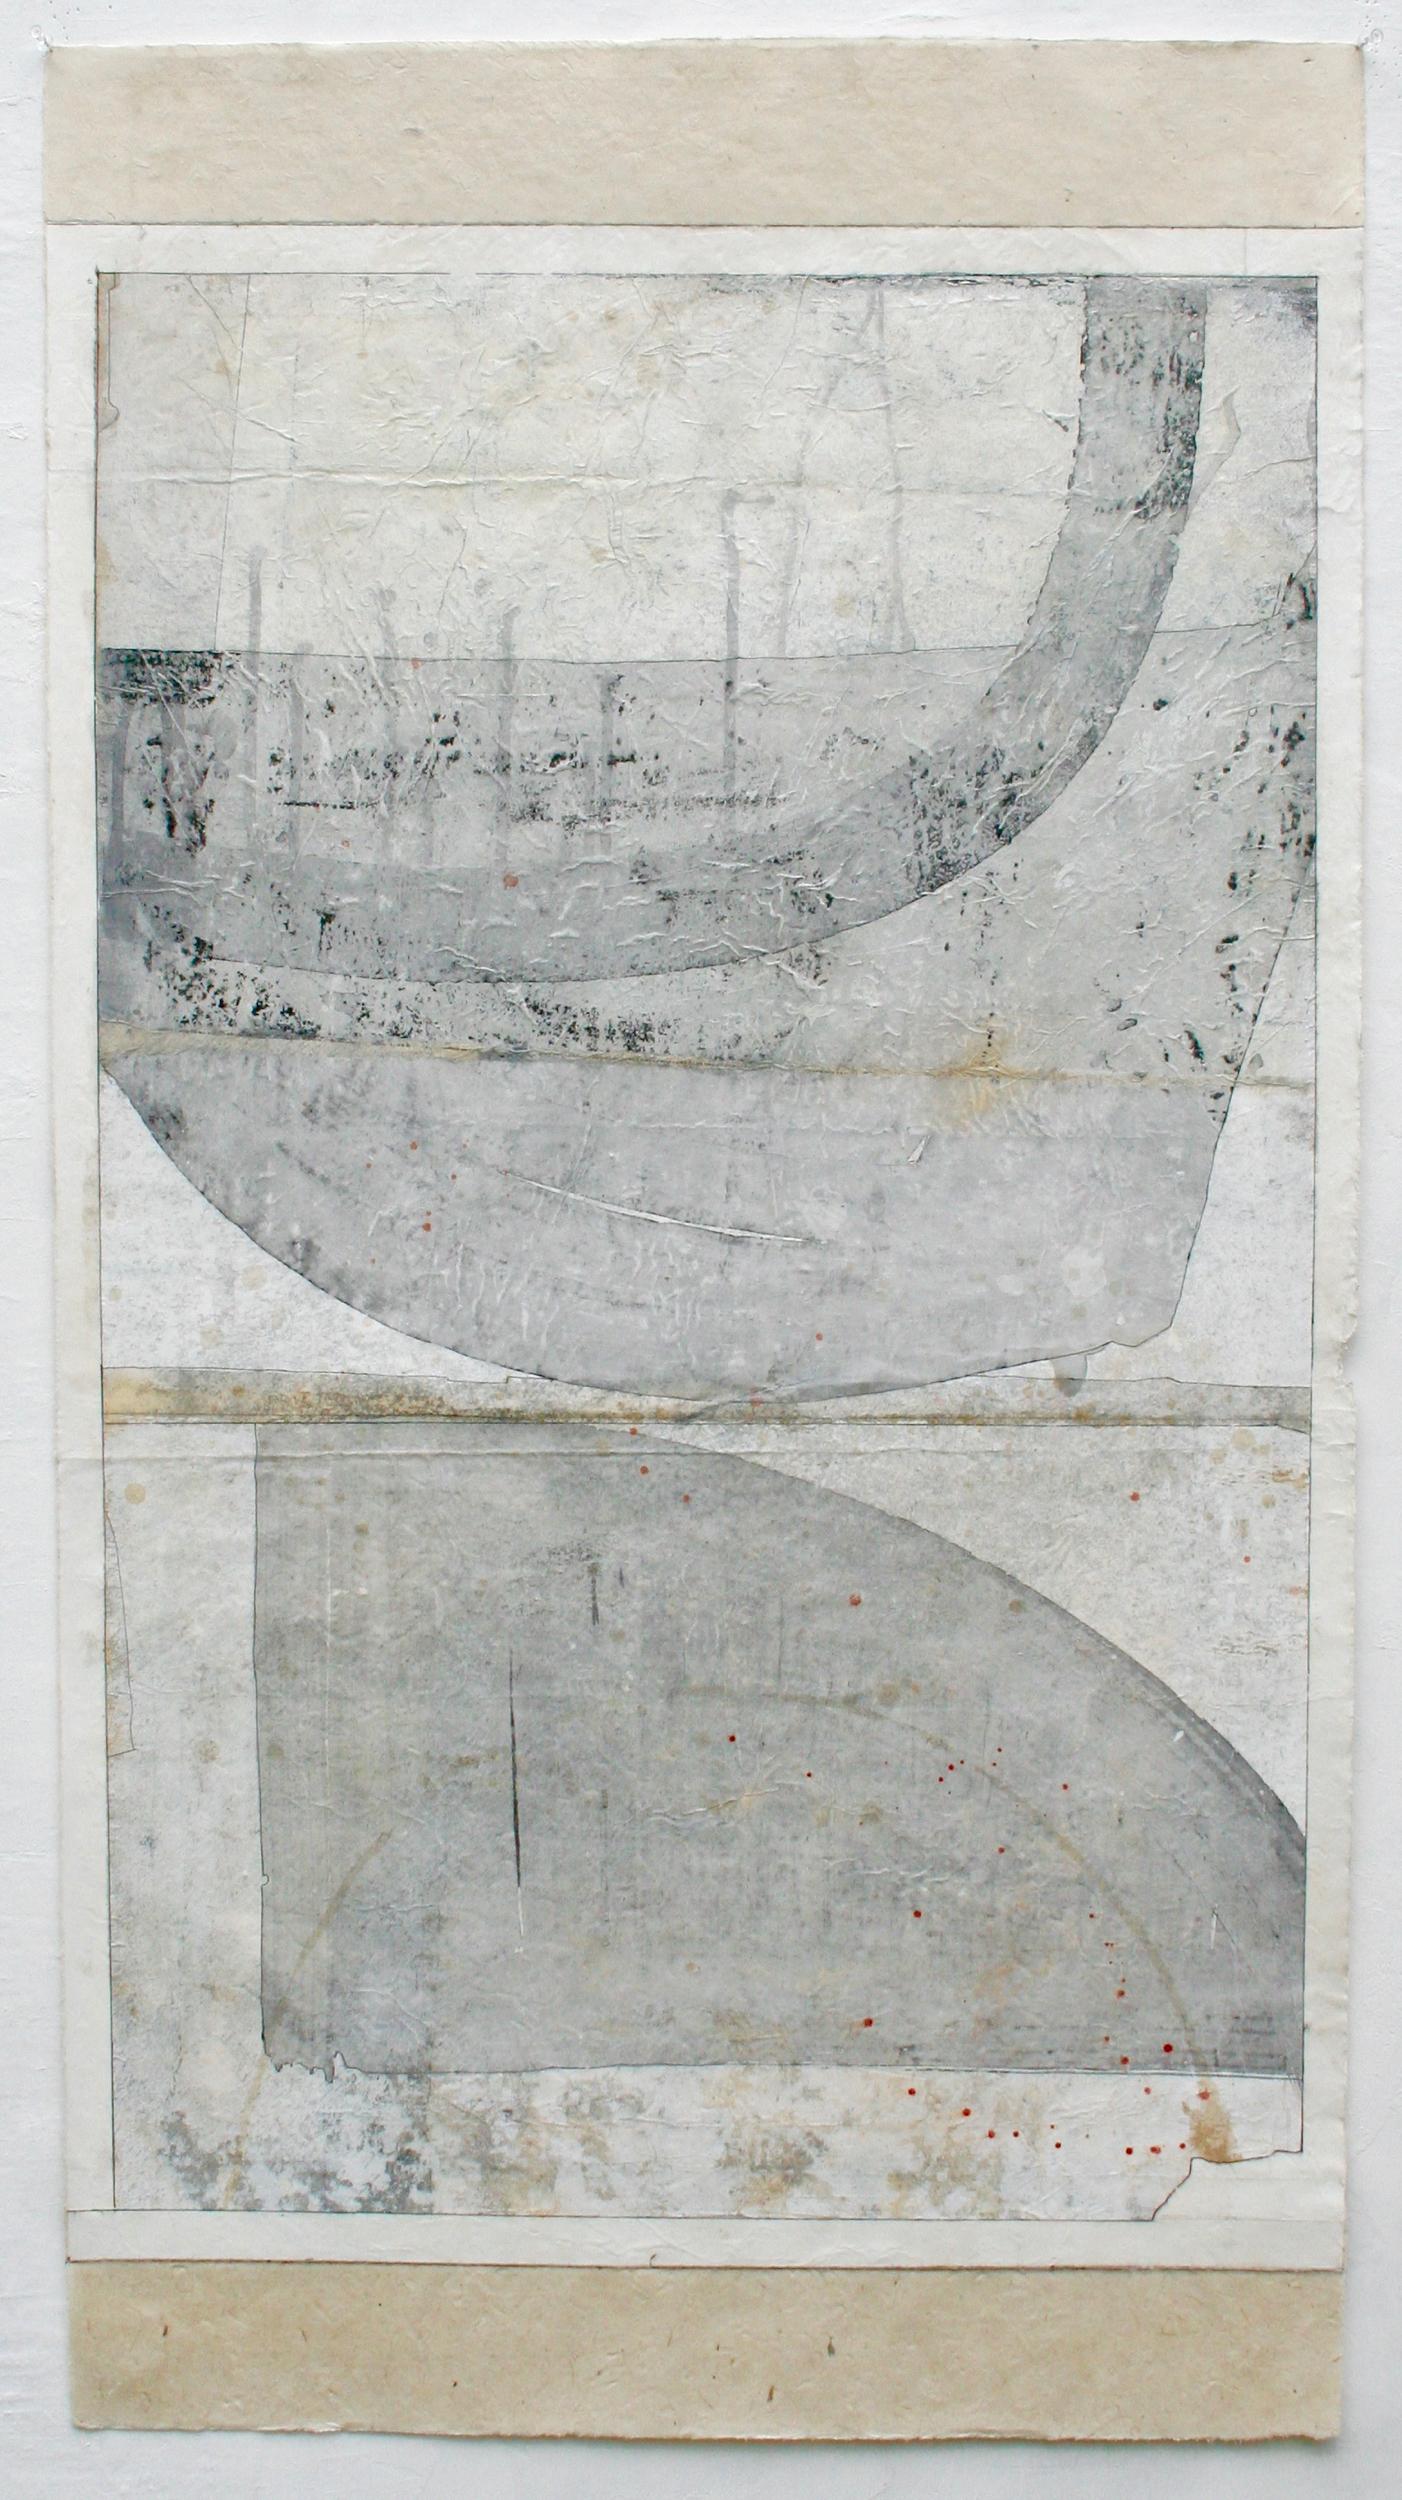 Giacometti  mixed media on Tibetan paper  48 x 25.5  sold  .  .  .  .